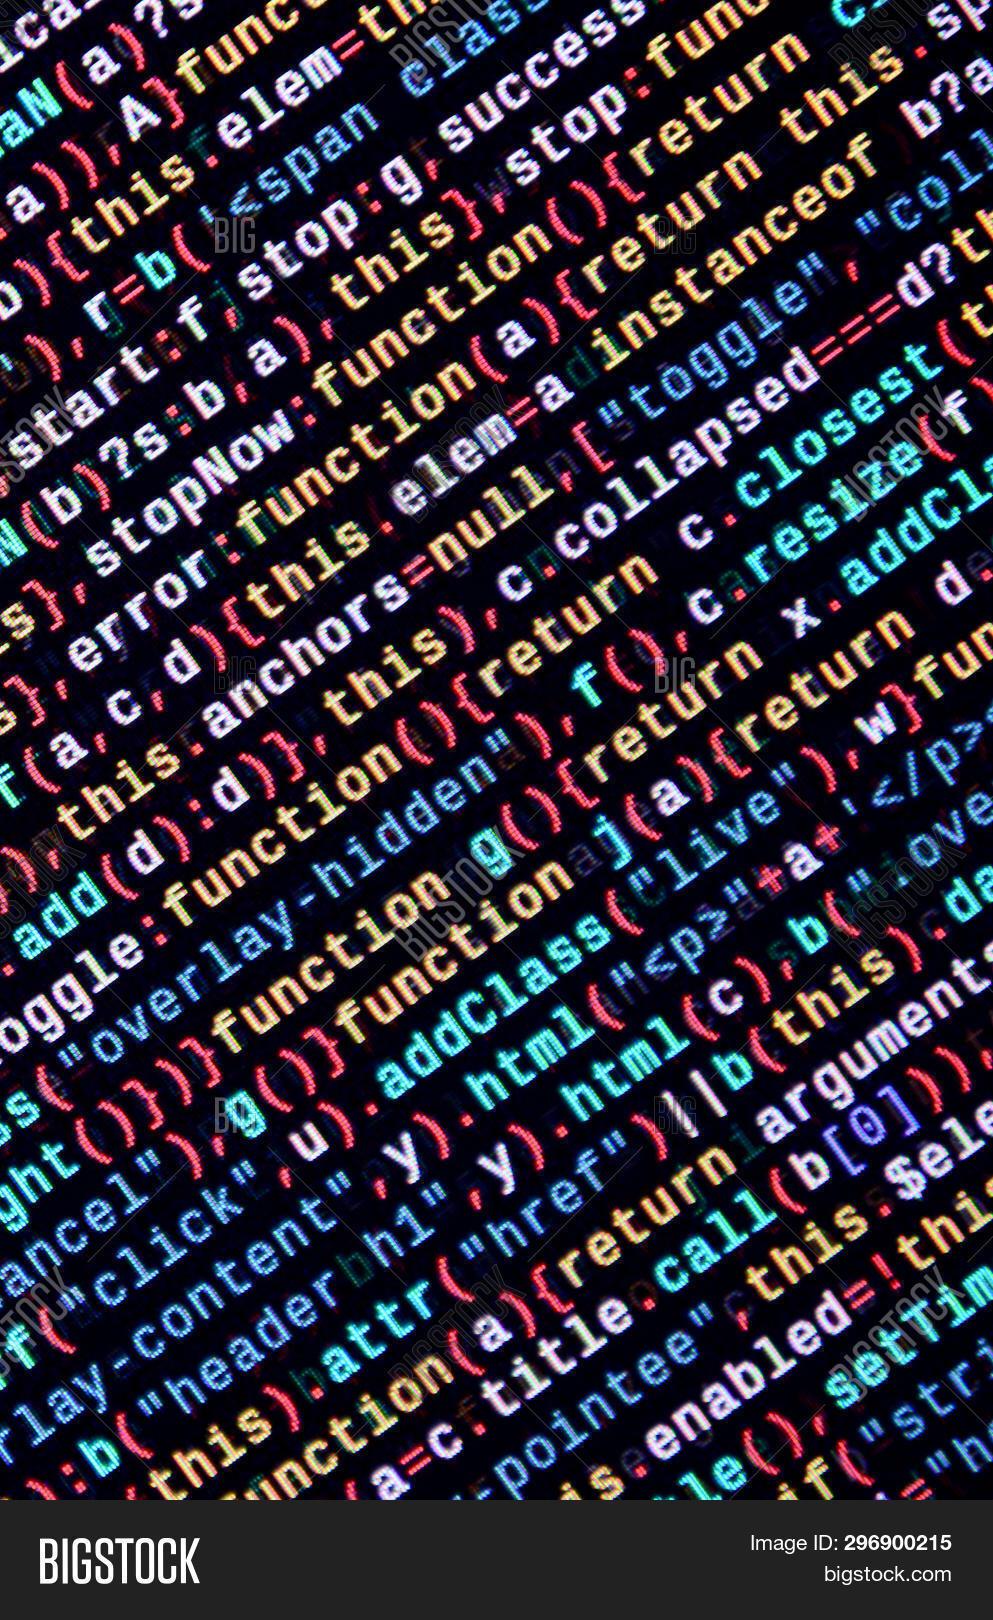 Javascript Code Text Image & Photo (Free Trial) | Bigstock